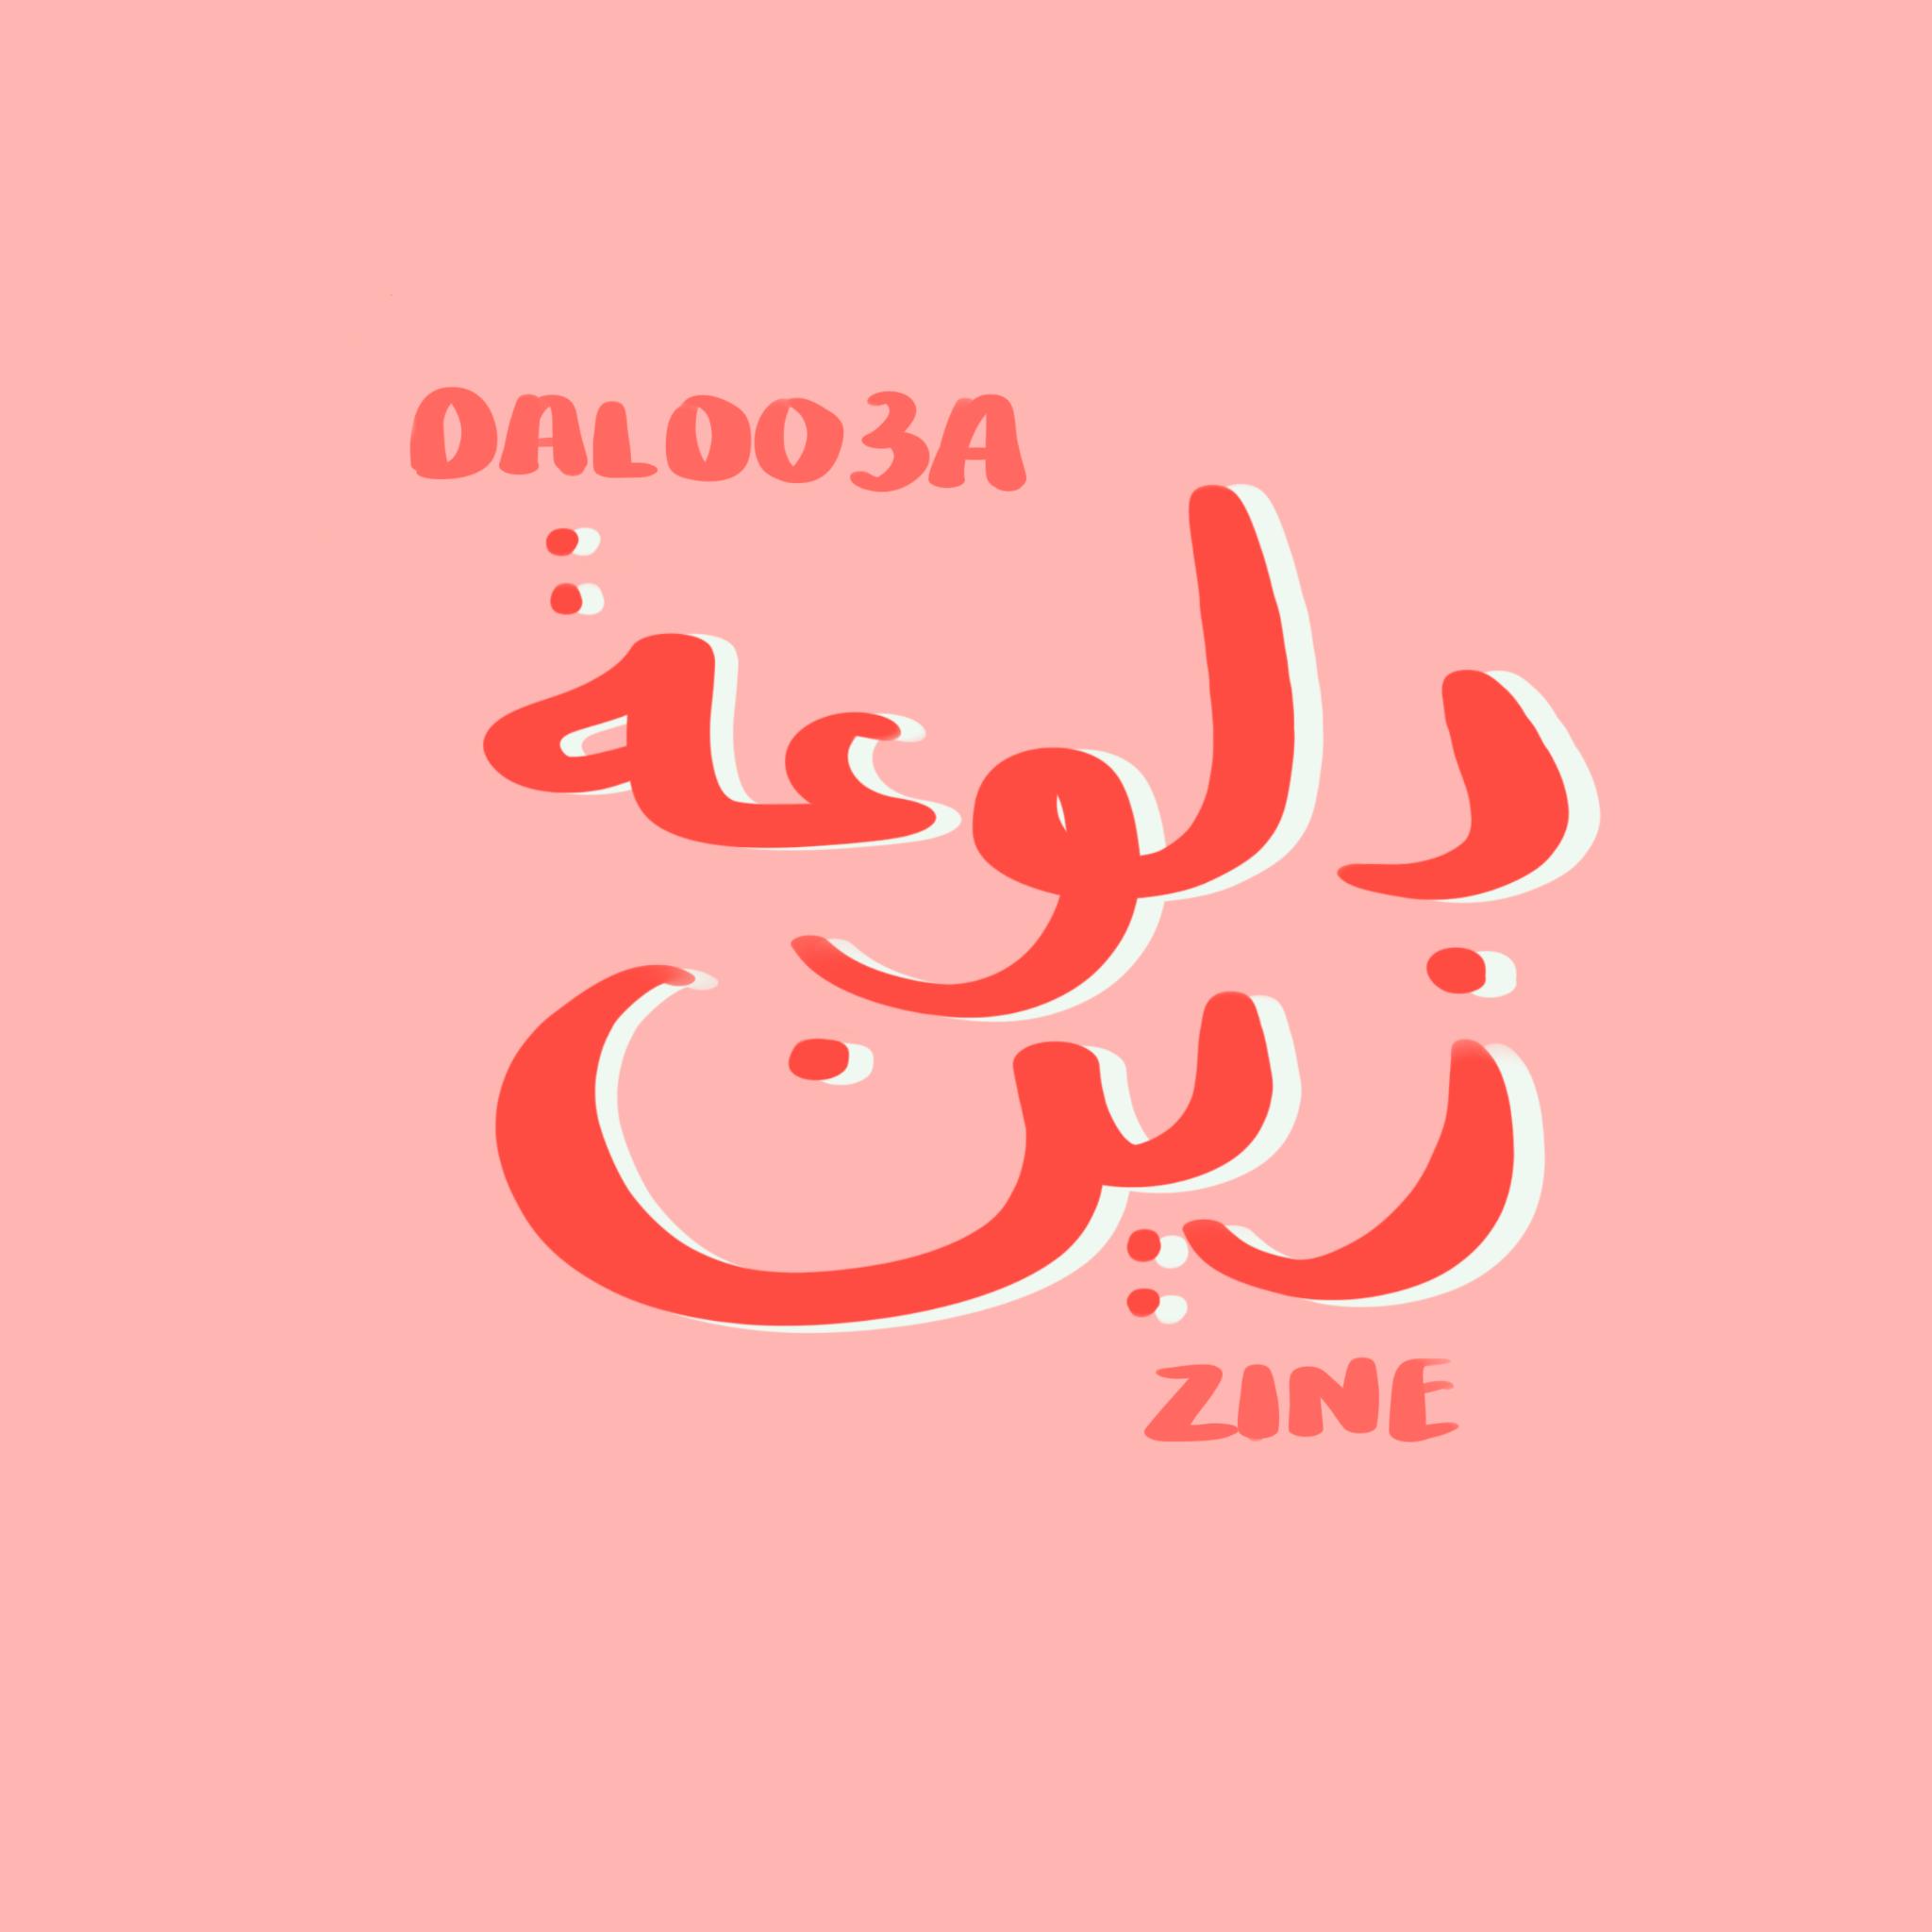 untitled_artwork 26